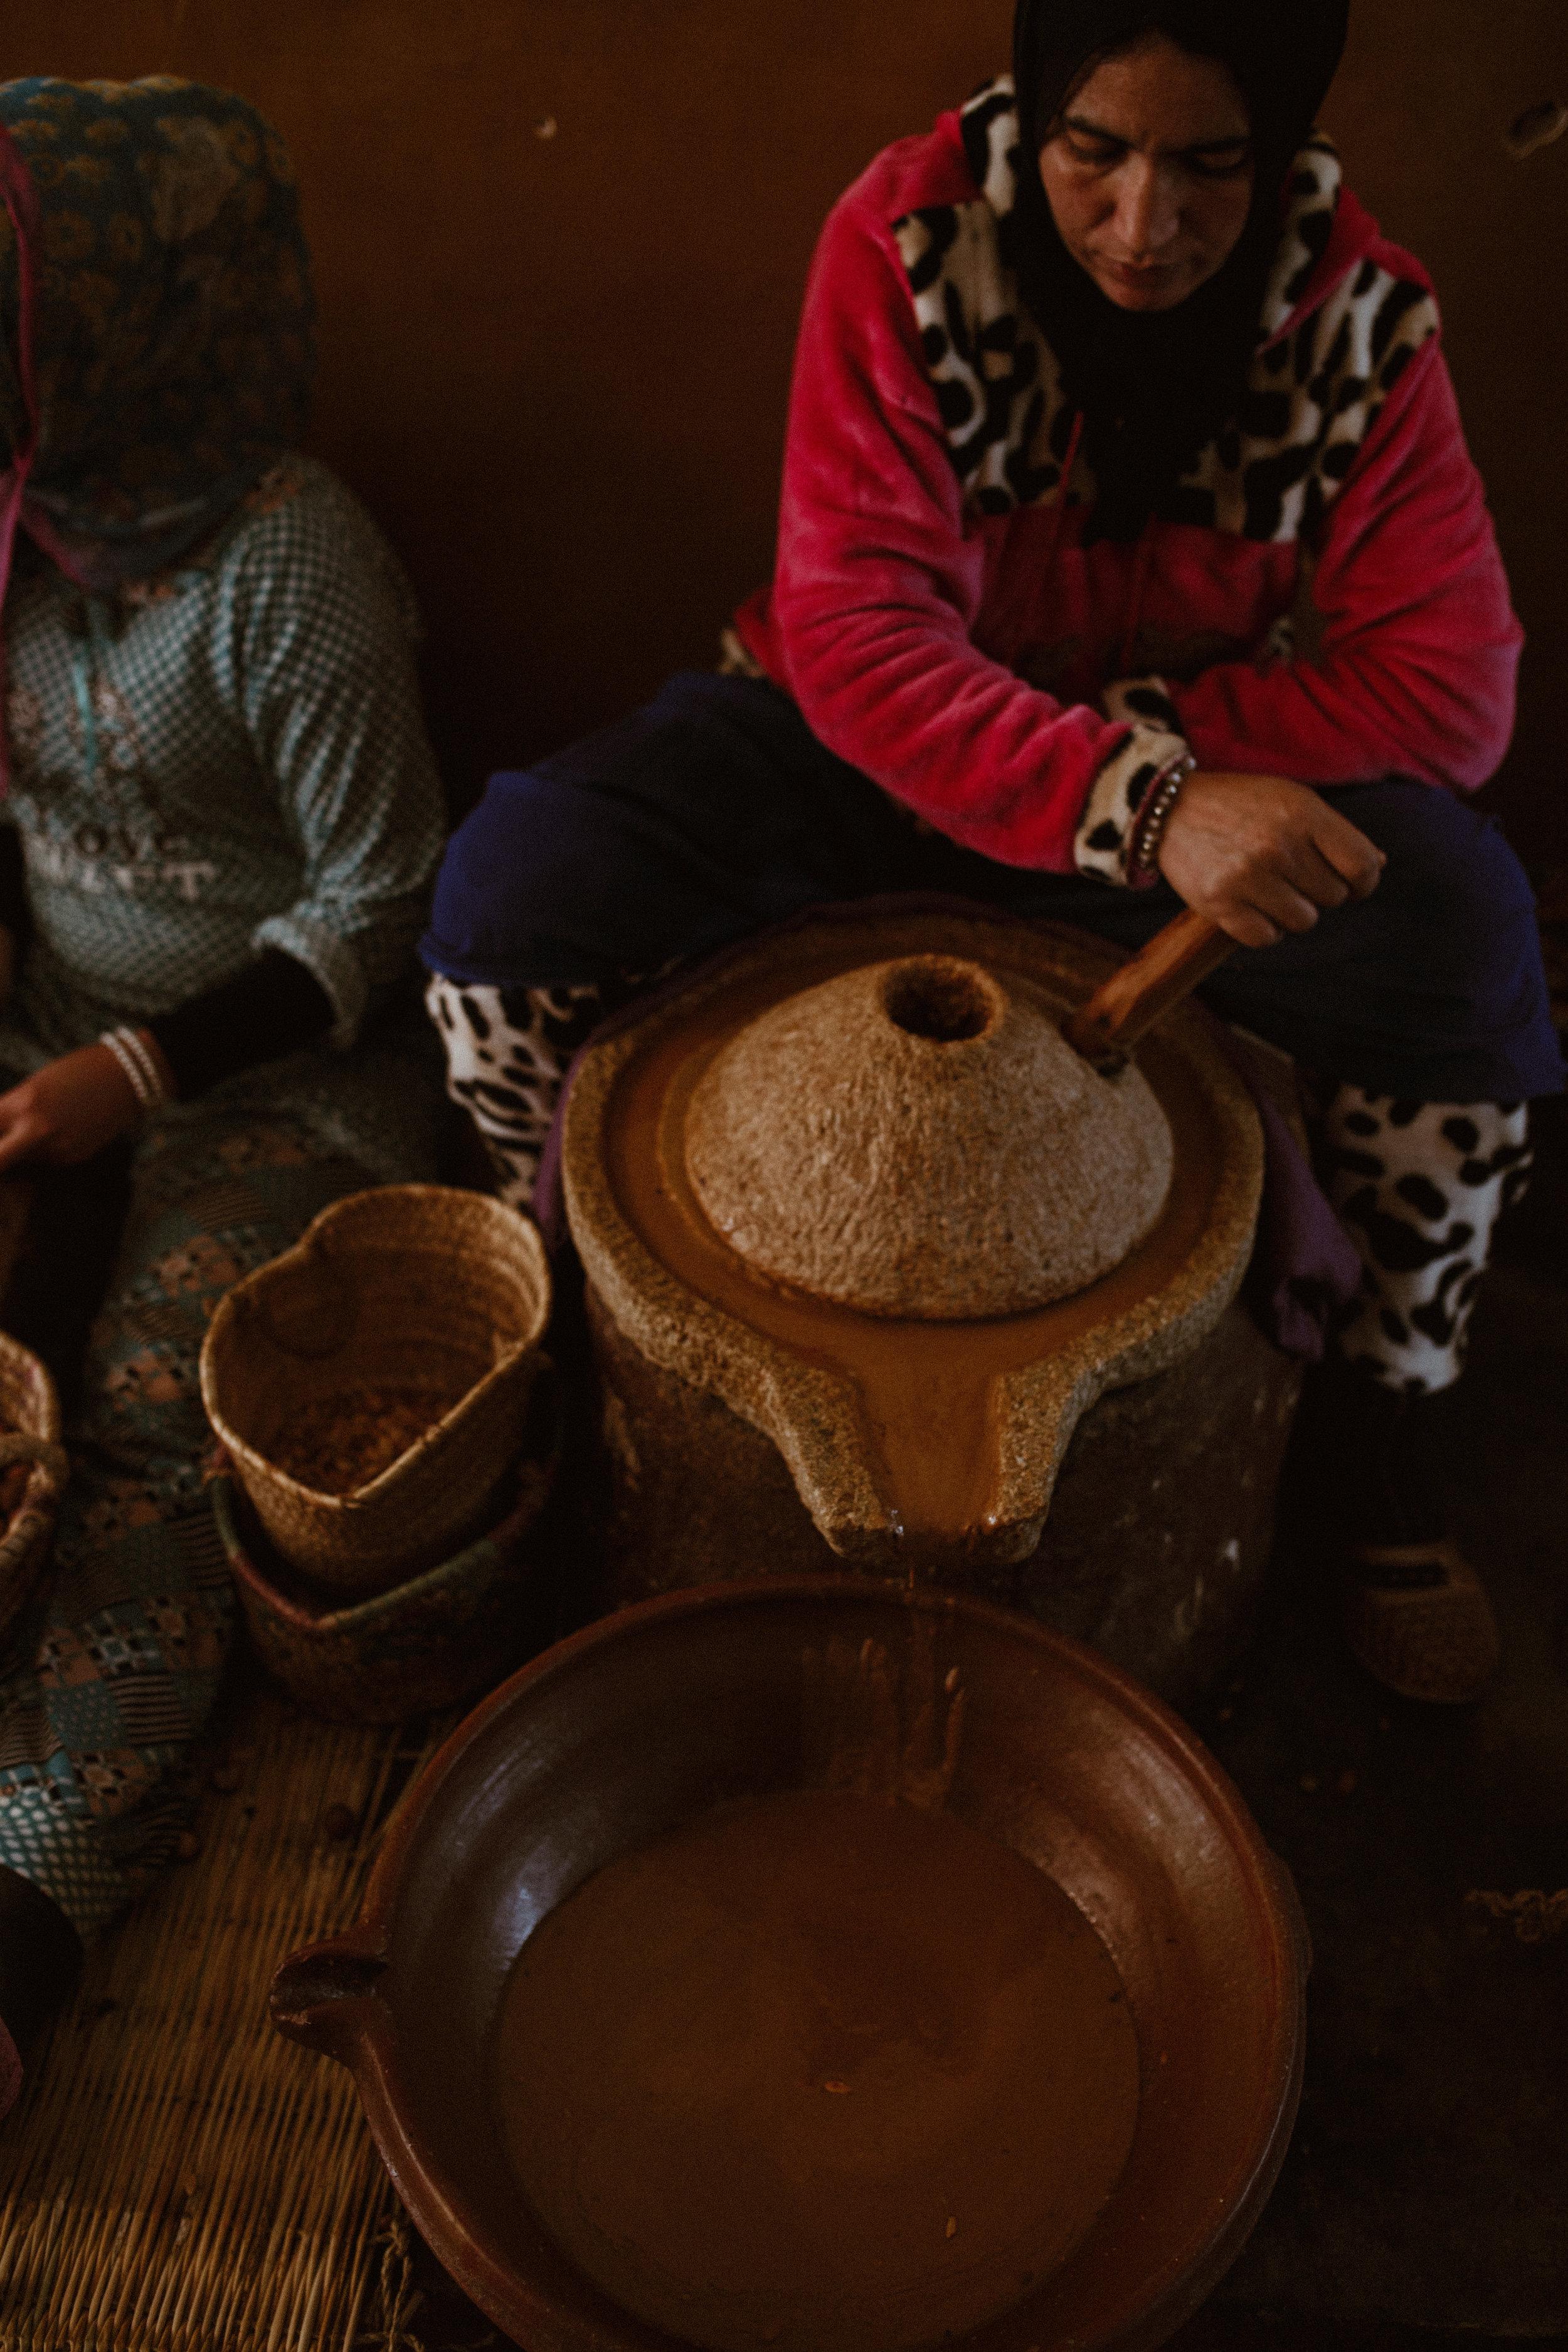 morocco-morocco travel-visit morocco-travel-travel photography-travel photographer-alina mendoza-alina mendoza photography-4.jpg